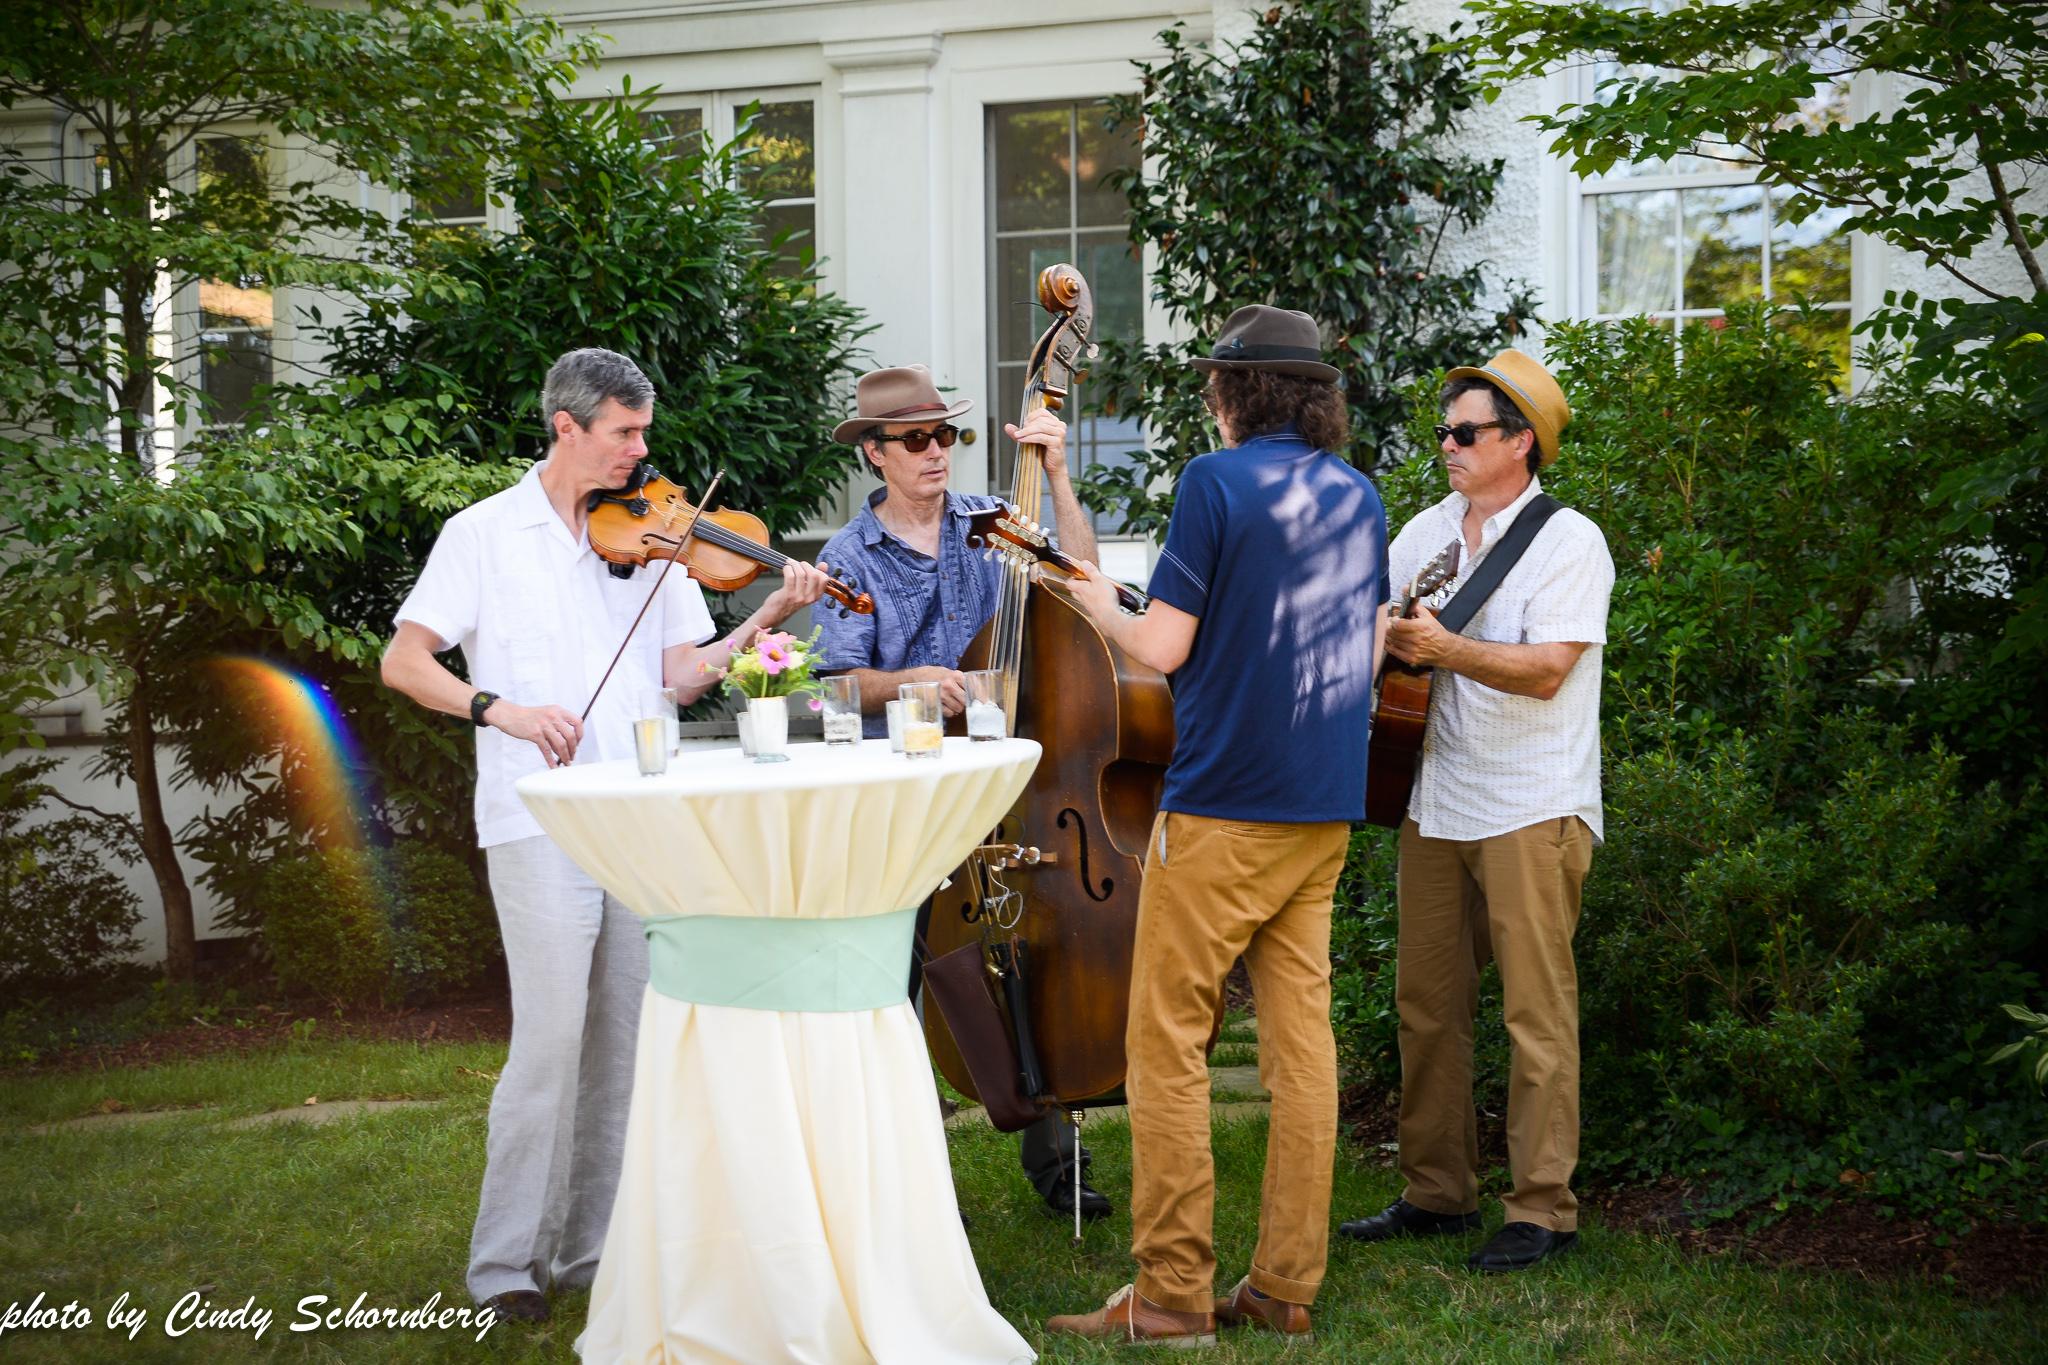 vineyard_weddings_Charlottesville_Virginia_0021.jpg